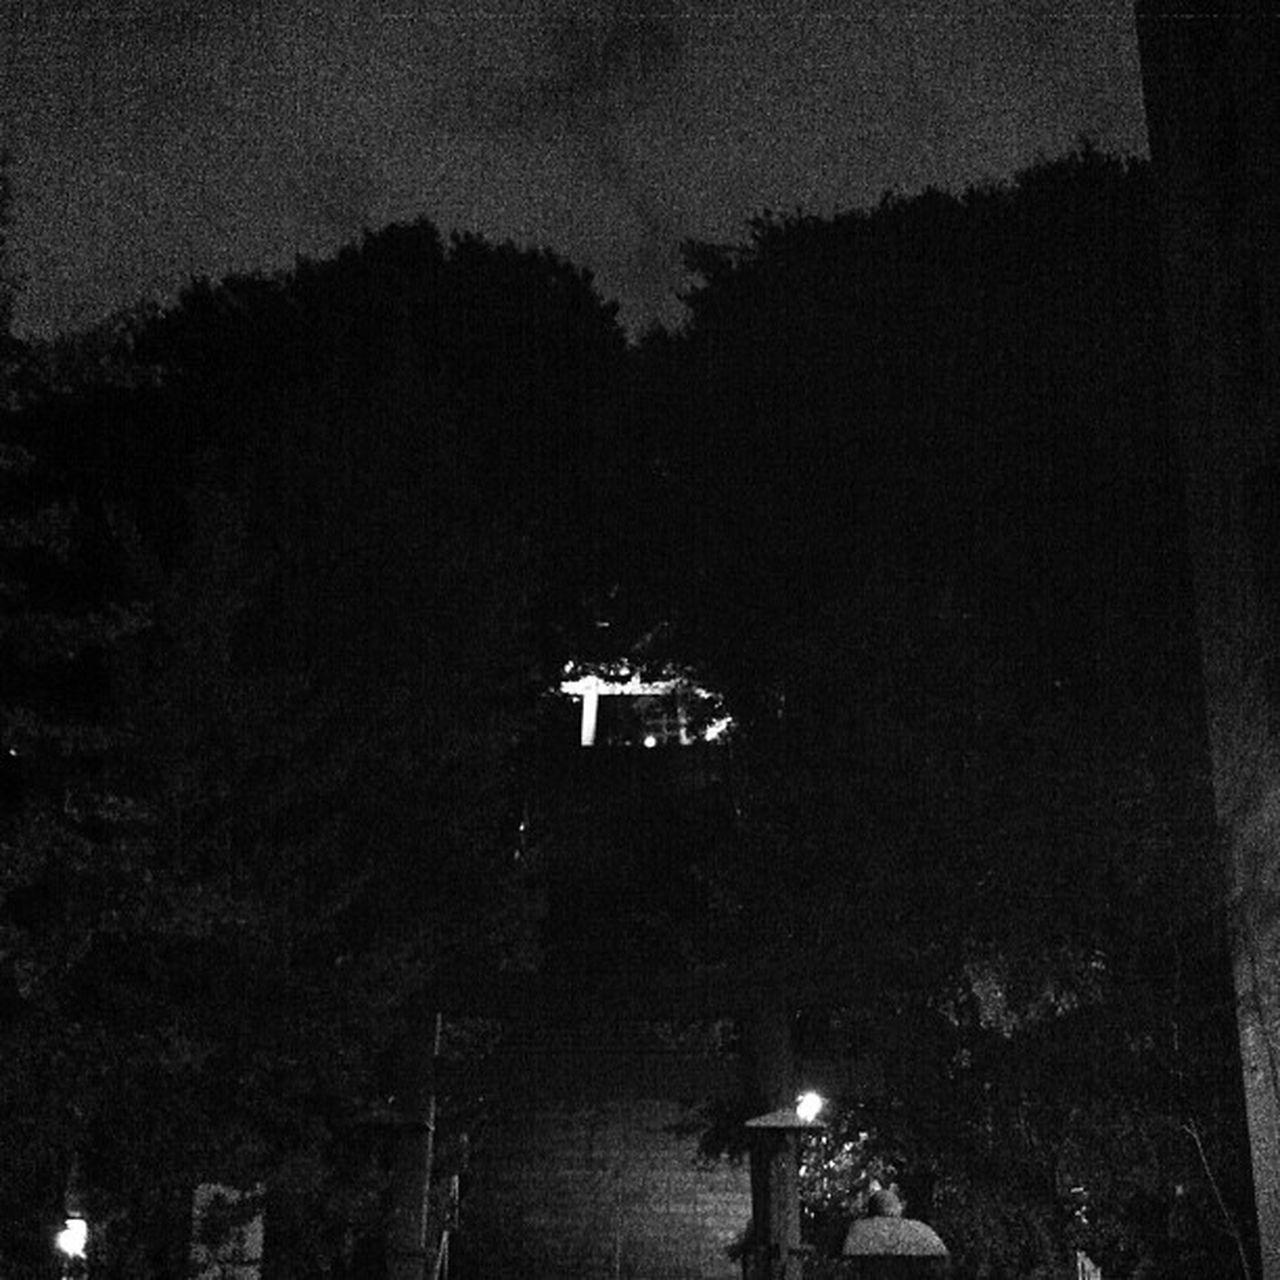 night, tree, illuminated, outdoors, no people, sky